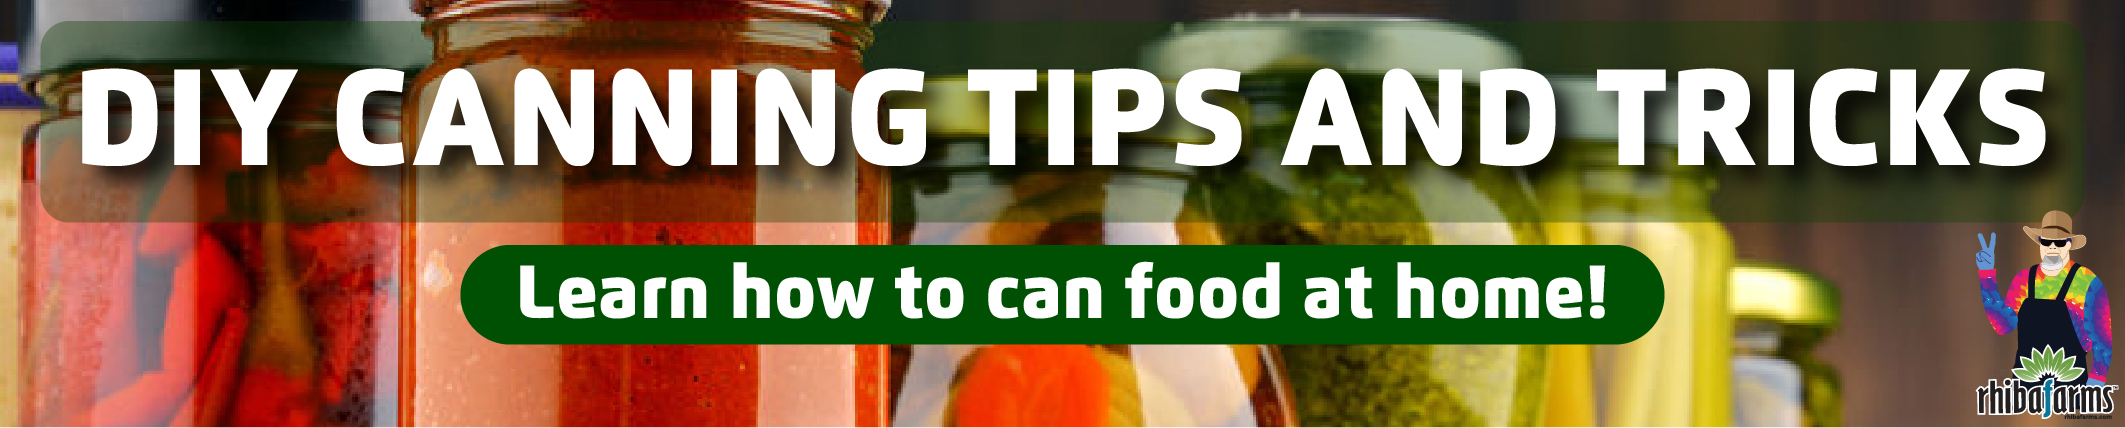 DIY-Canning-Tips-Tricks (1)